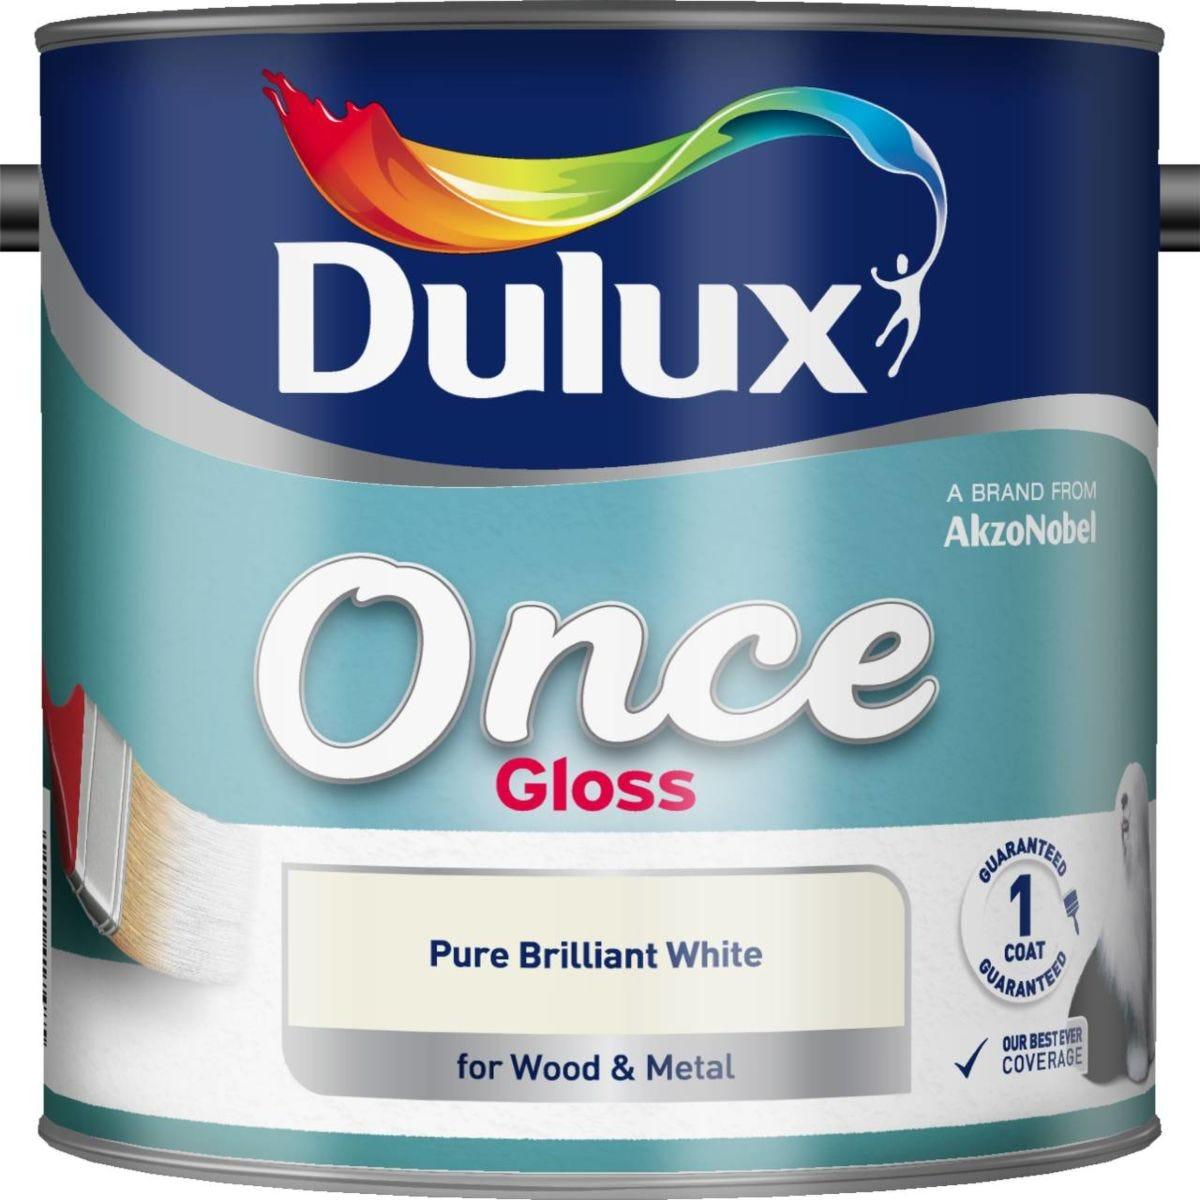 Dulux Once Gloss Brilliant White Paint - 2.5L